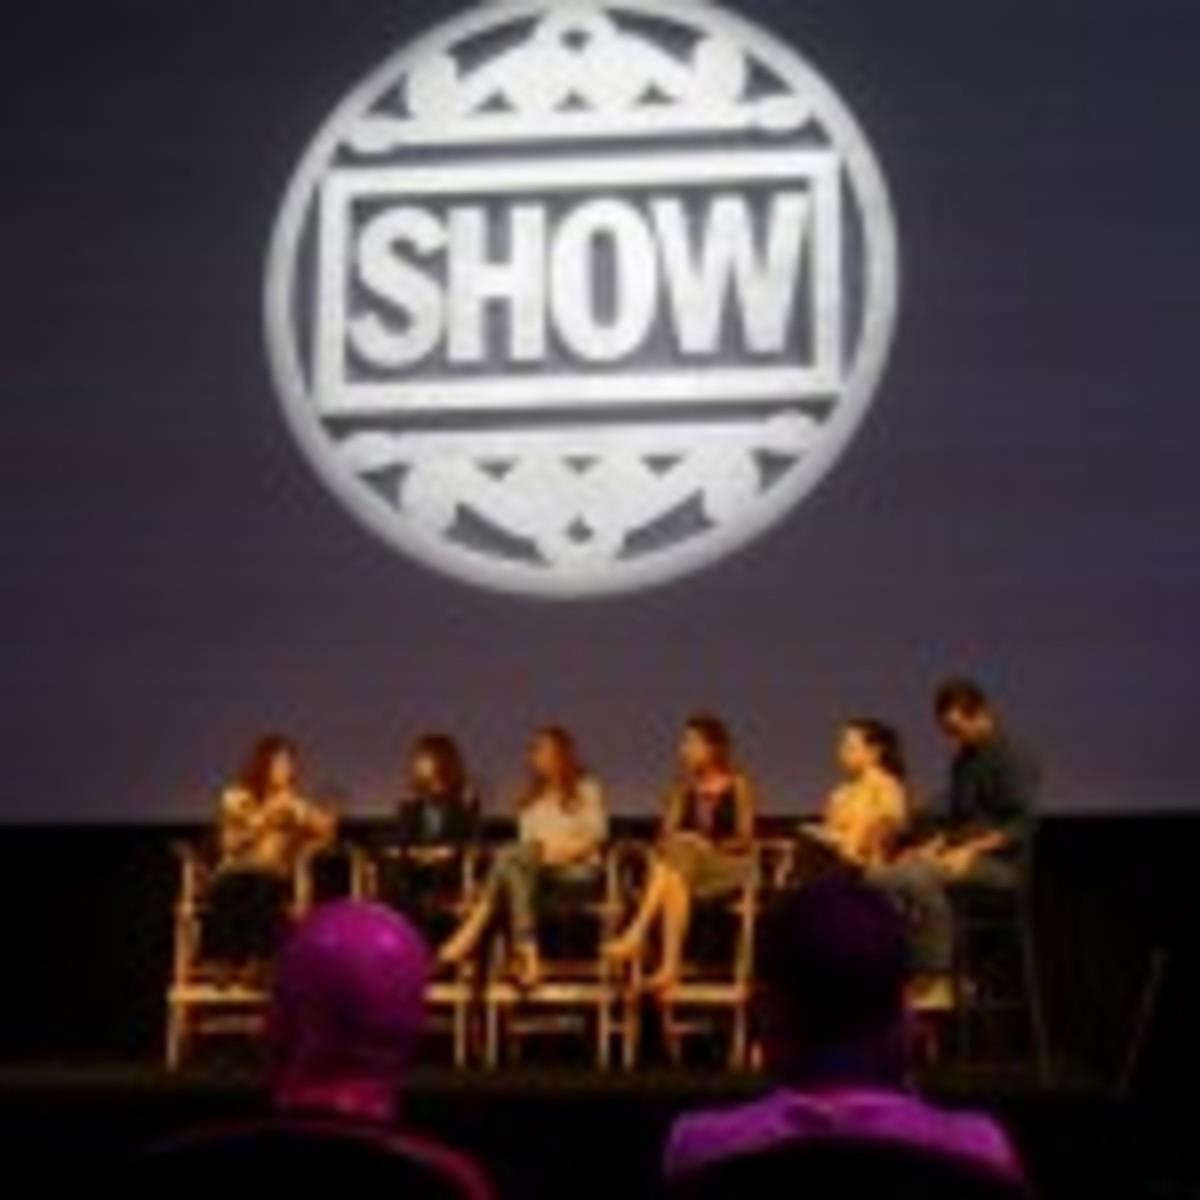 Telluride Film Festival Q&A session with cast and crew of Palo Alto